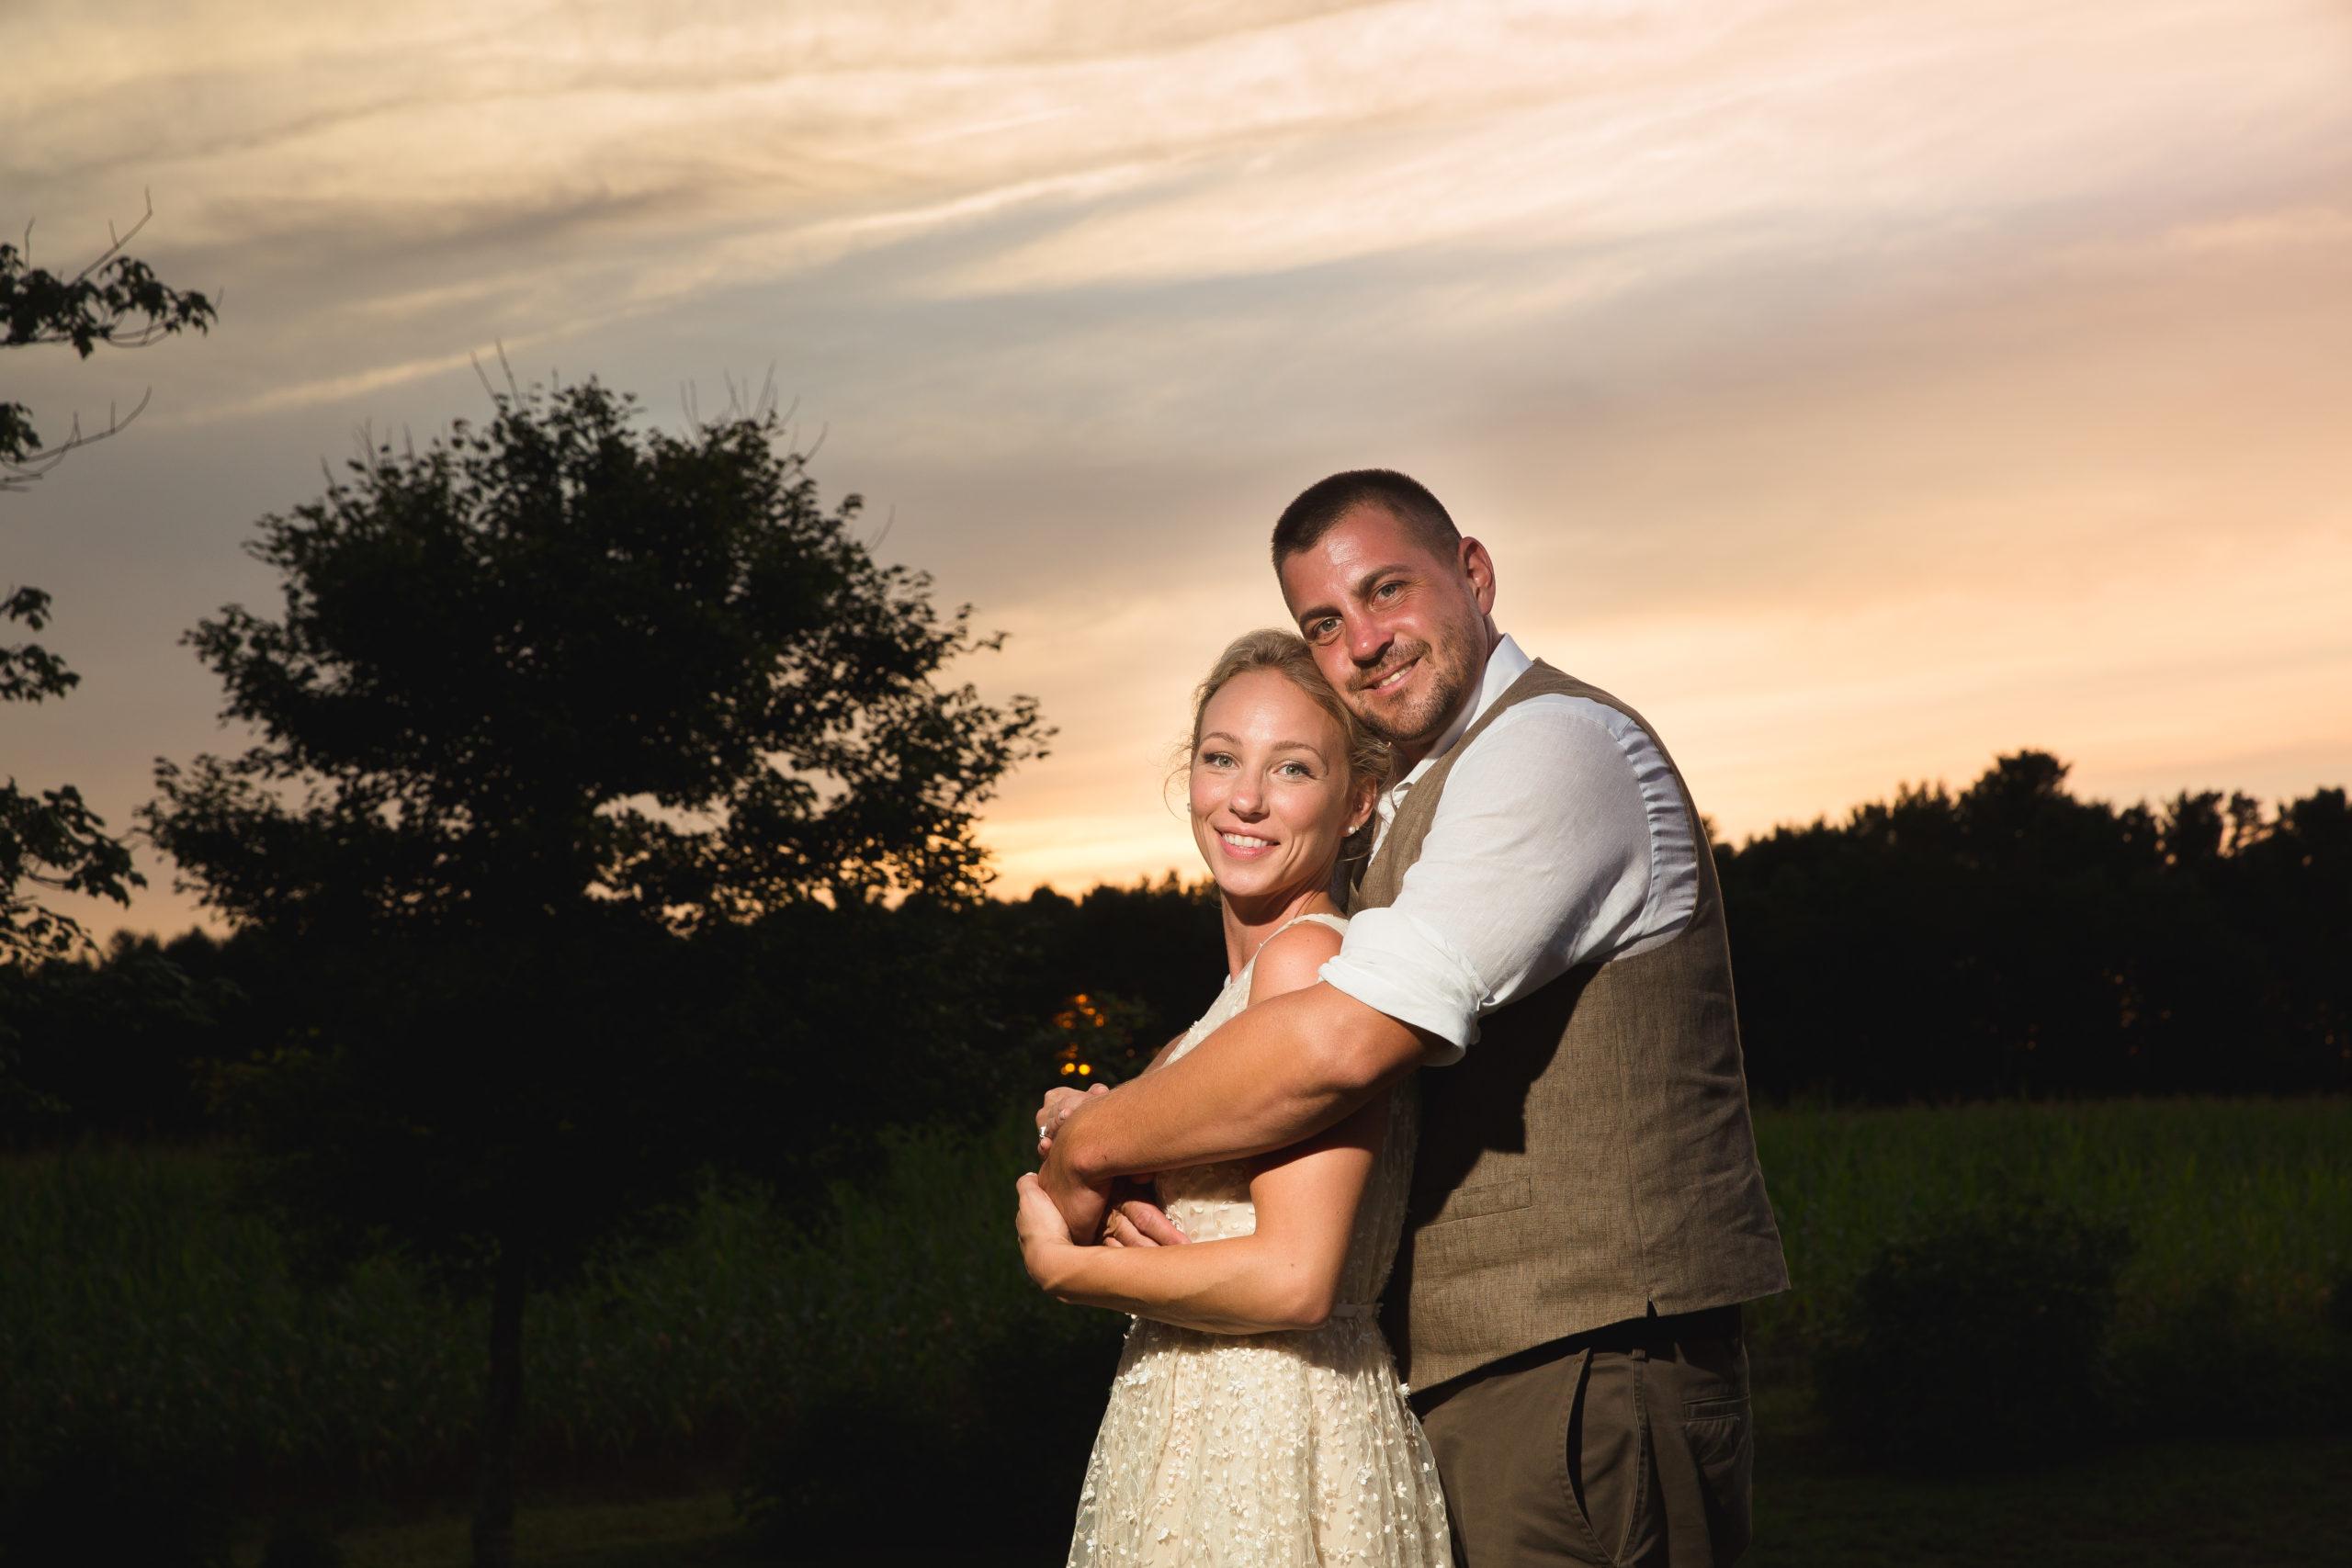 Coventry, Rhode Island, RI, Backyard Wedding, forest, earthy, wedding, tracy jenkins photography, wedding photographer, ri wedding photographer, Rhode Island Wedding photographer, sunset, couple photos